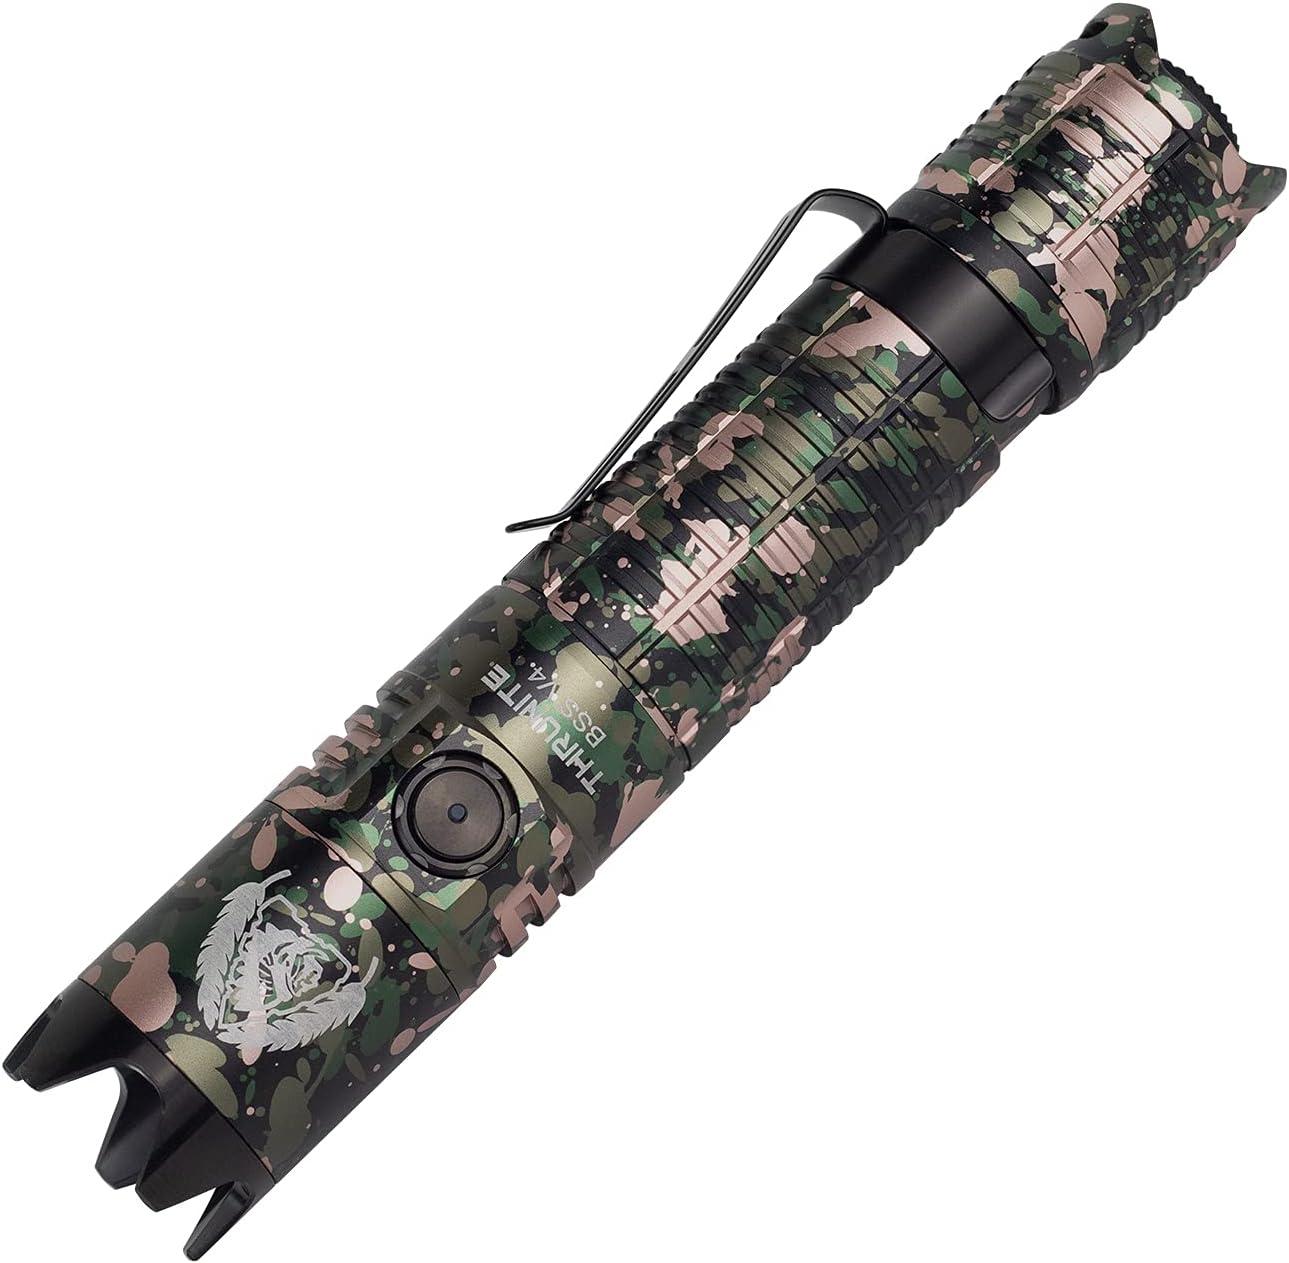 THRUNITE 毎日がバーゲンセール BSS V4 Flashlight Customized Survival Scout Black Editi 毎日続々入荷